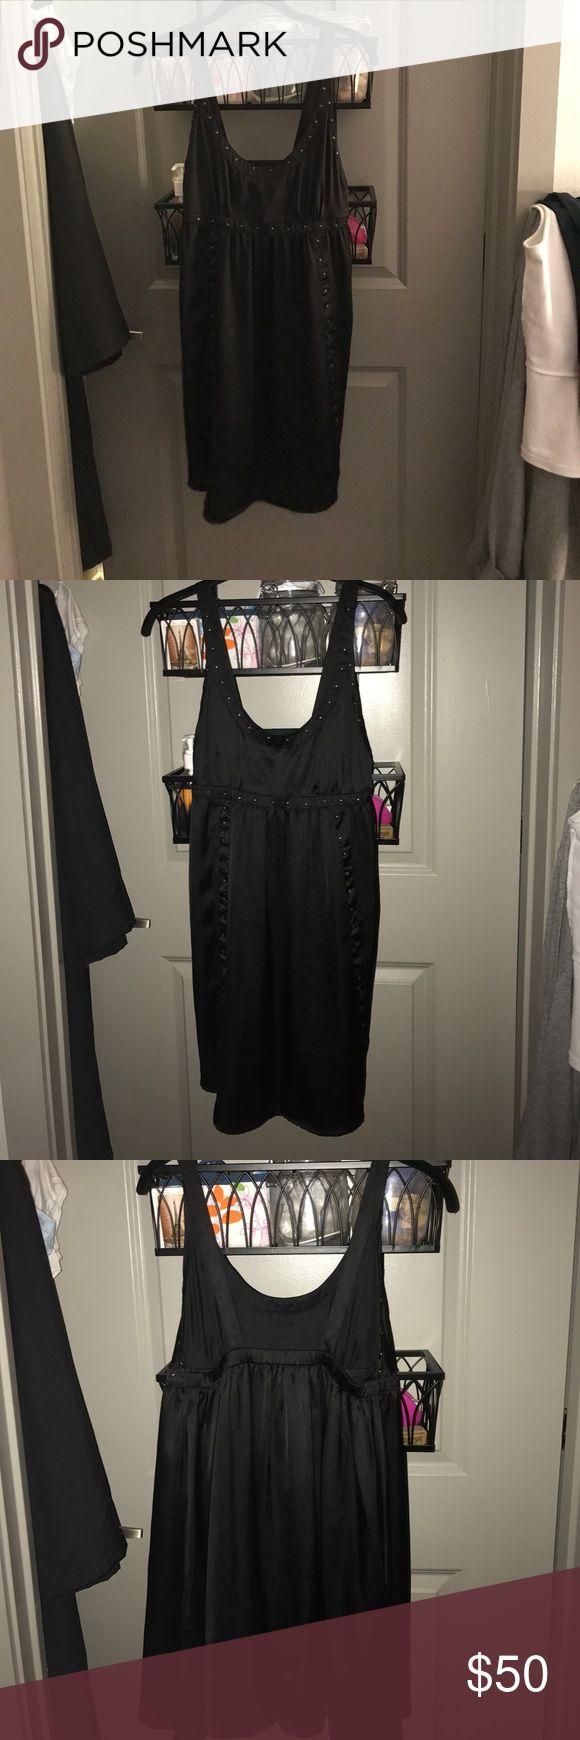 Zara black silk mini dress with gold studs Open back, beautiful going out dress with gold studs on the outlines and sleeves NWOT Zara Dresses Mini